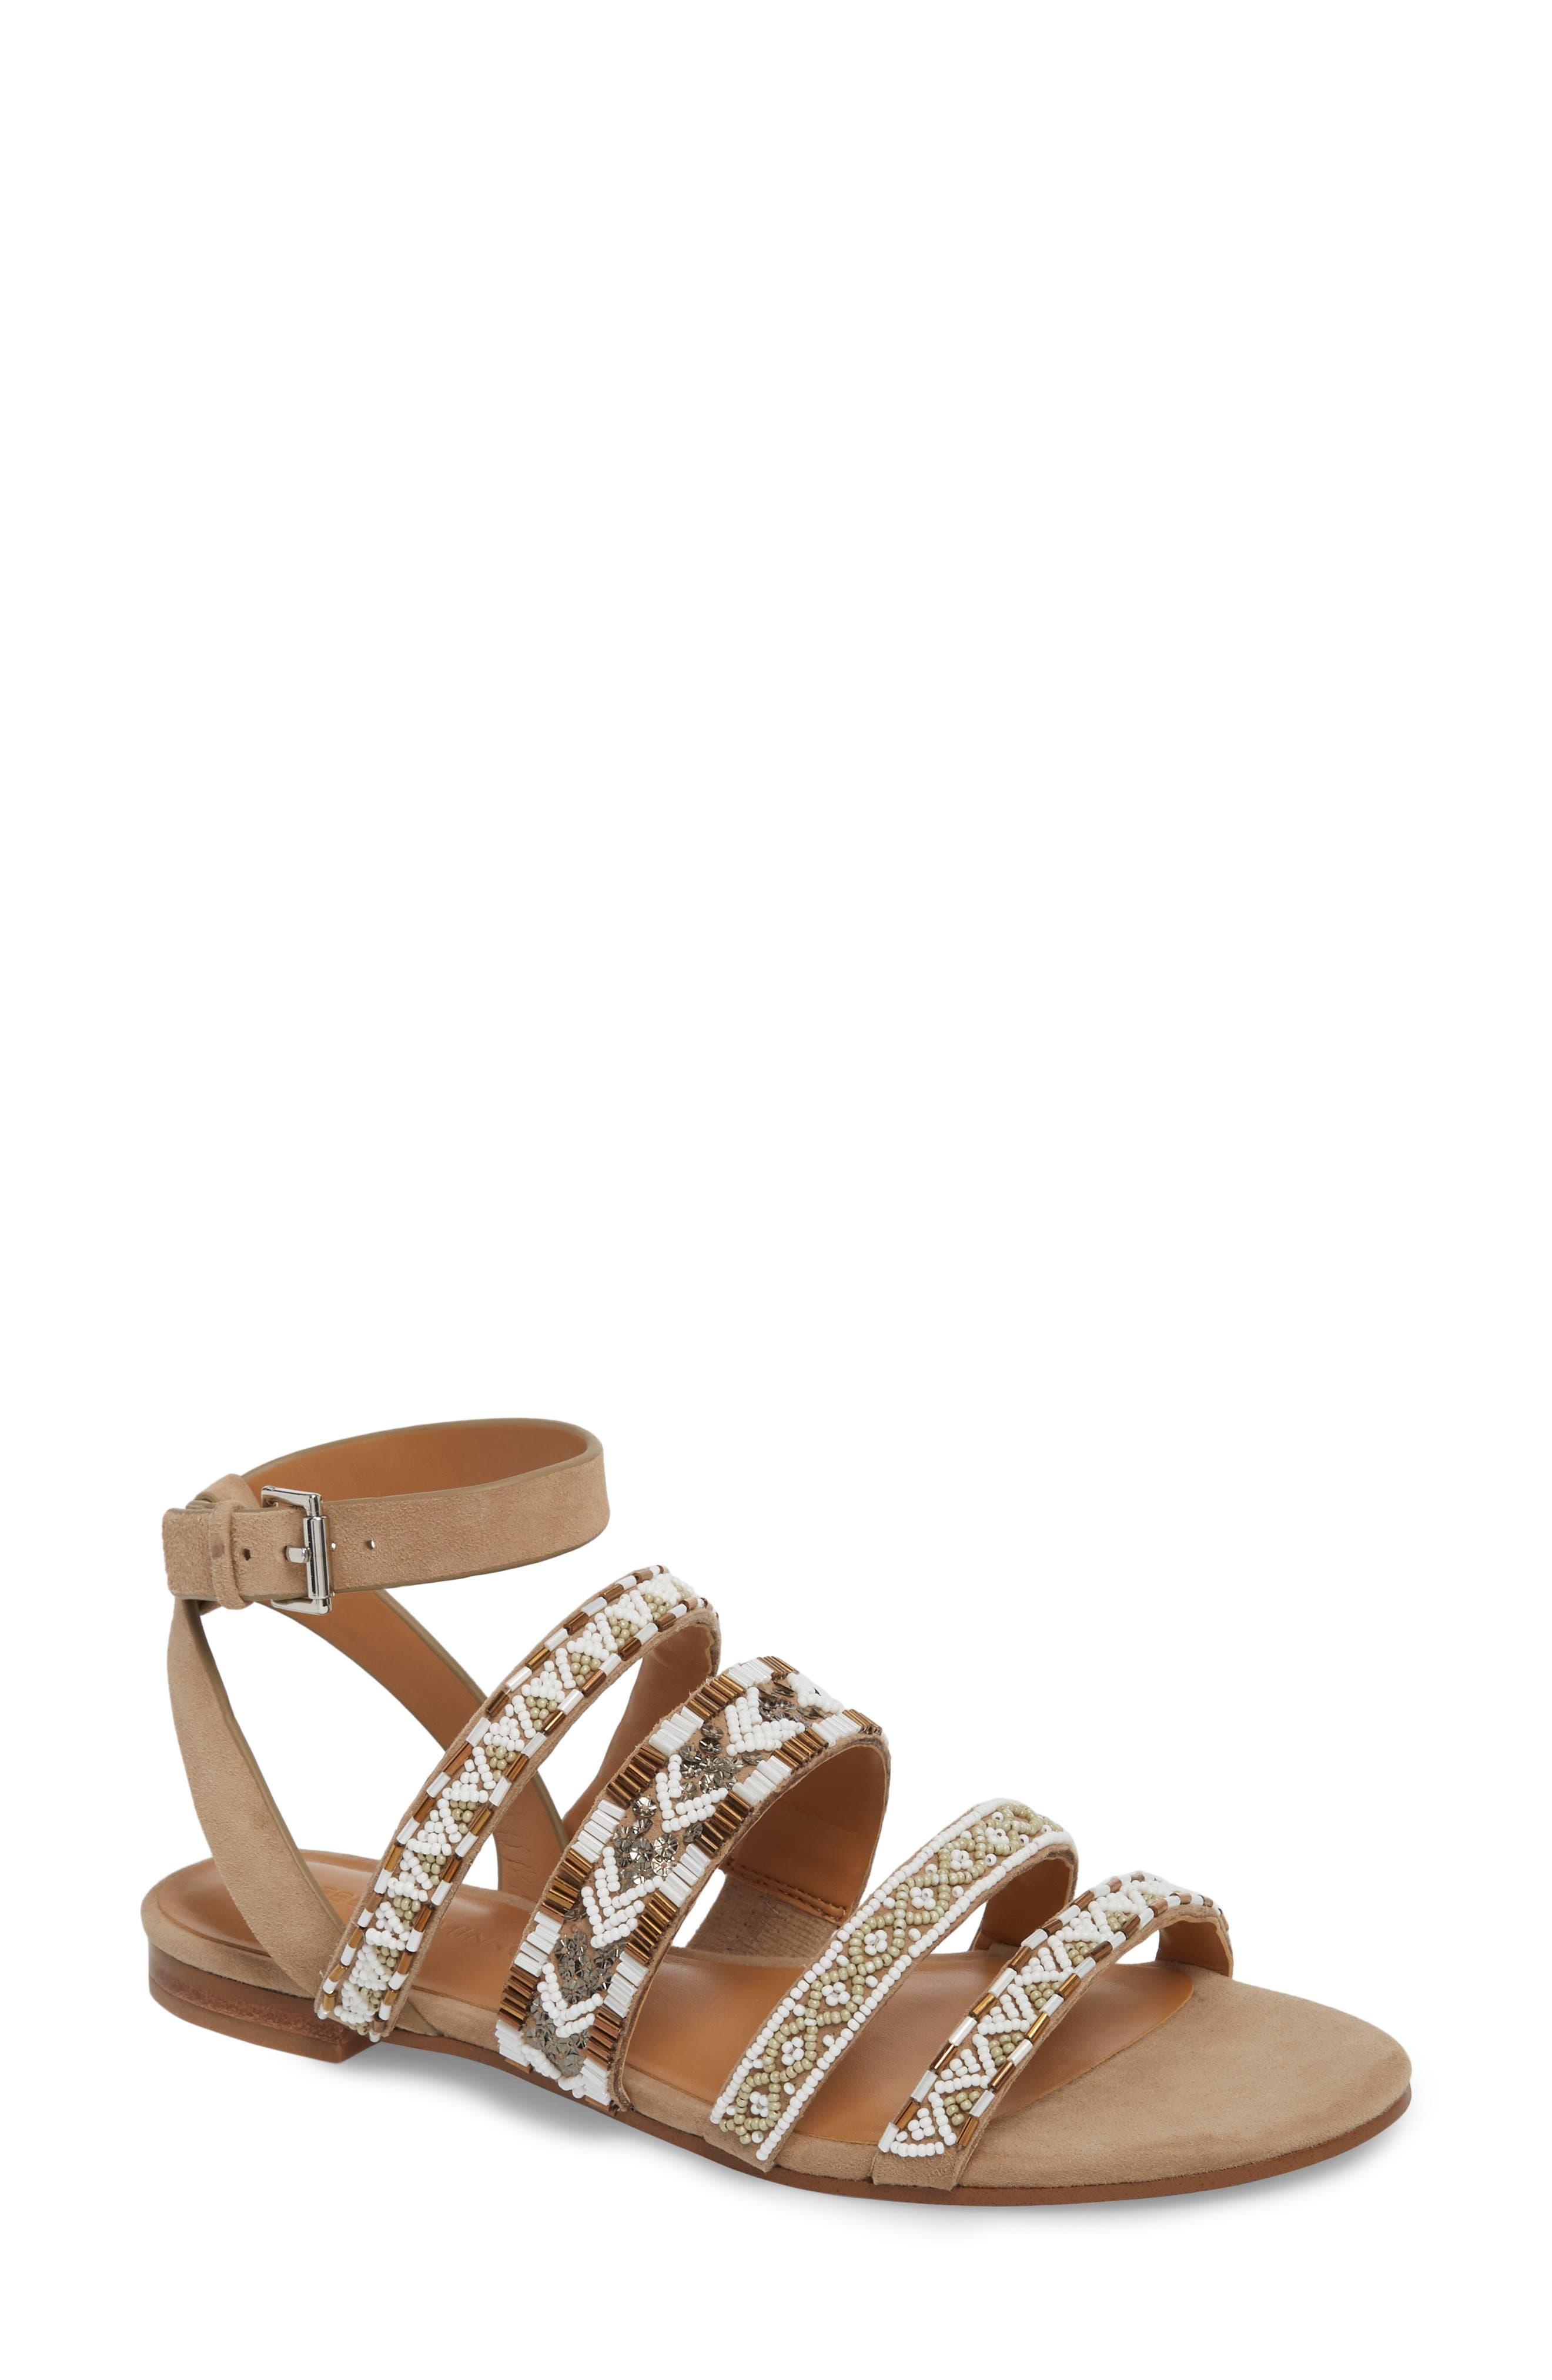 Leila Strappy Sandal,                         Main,                         color, Aztec Multi Suede